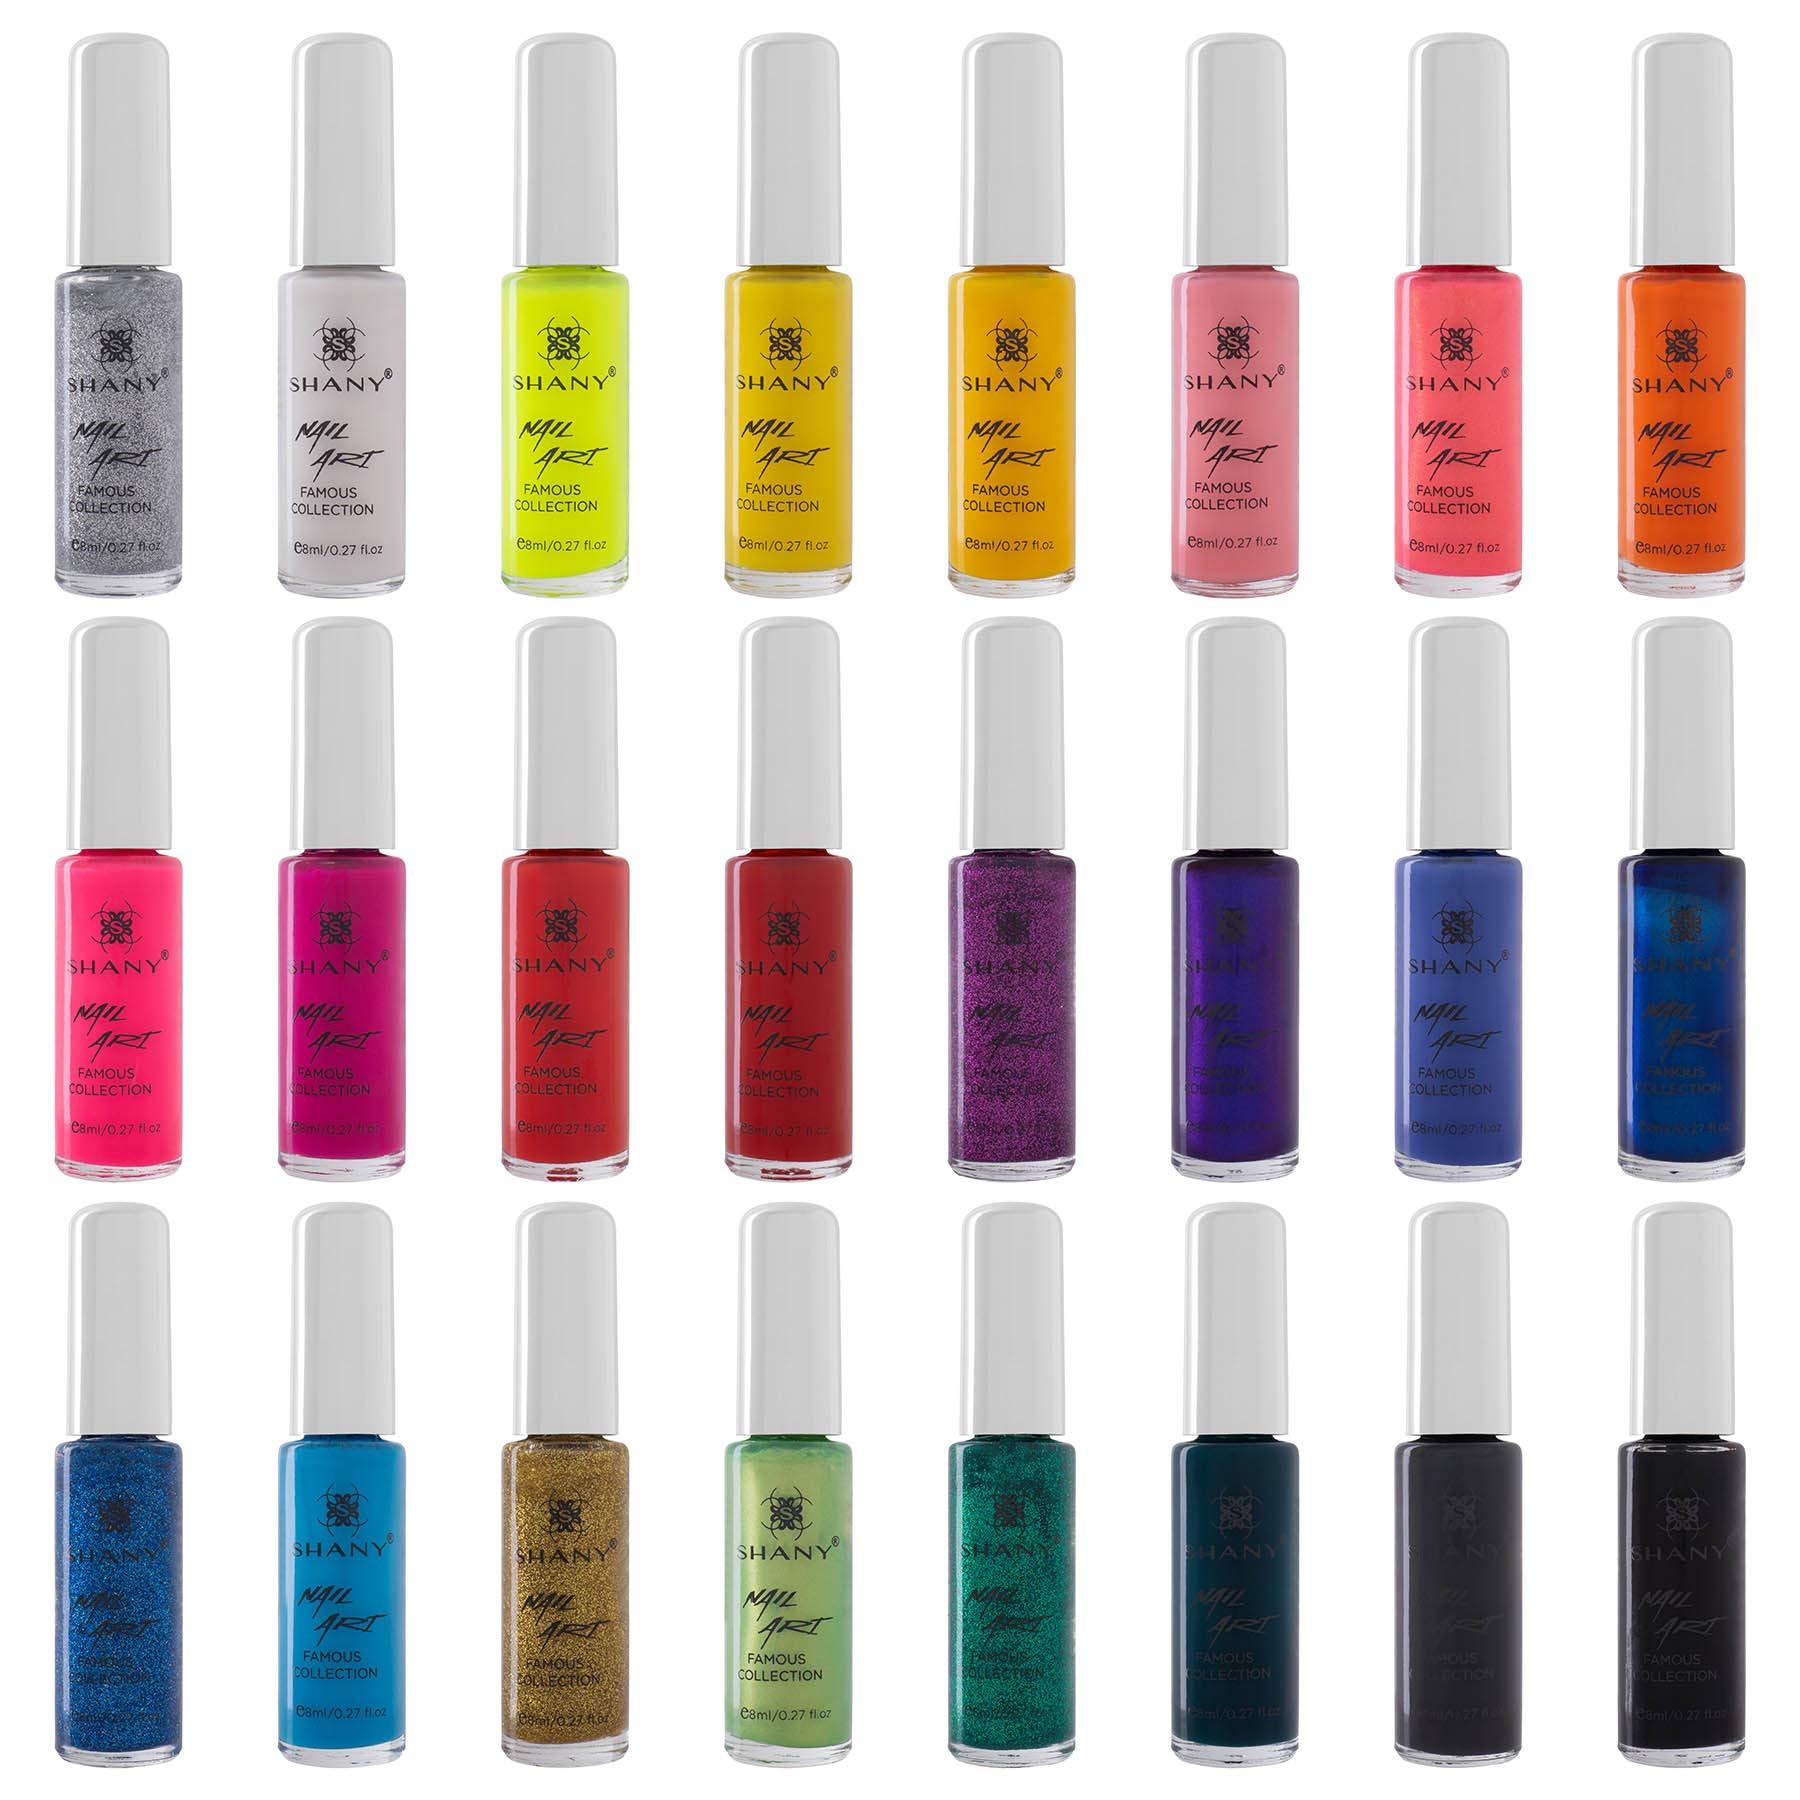 SHANY Nail Art Set (24 Famous Colors Nail Art Polish, Nail Art Decoration) by SHANY Cosmetics